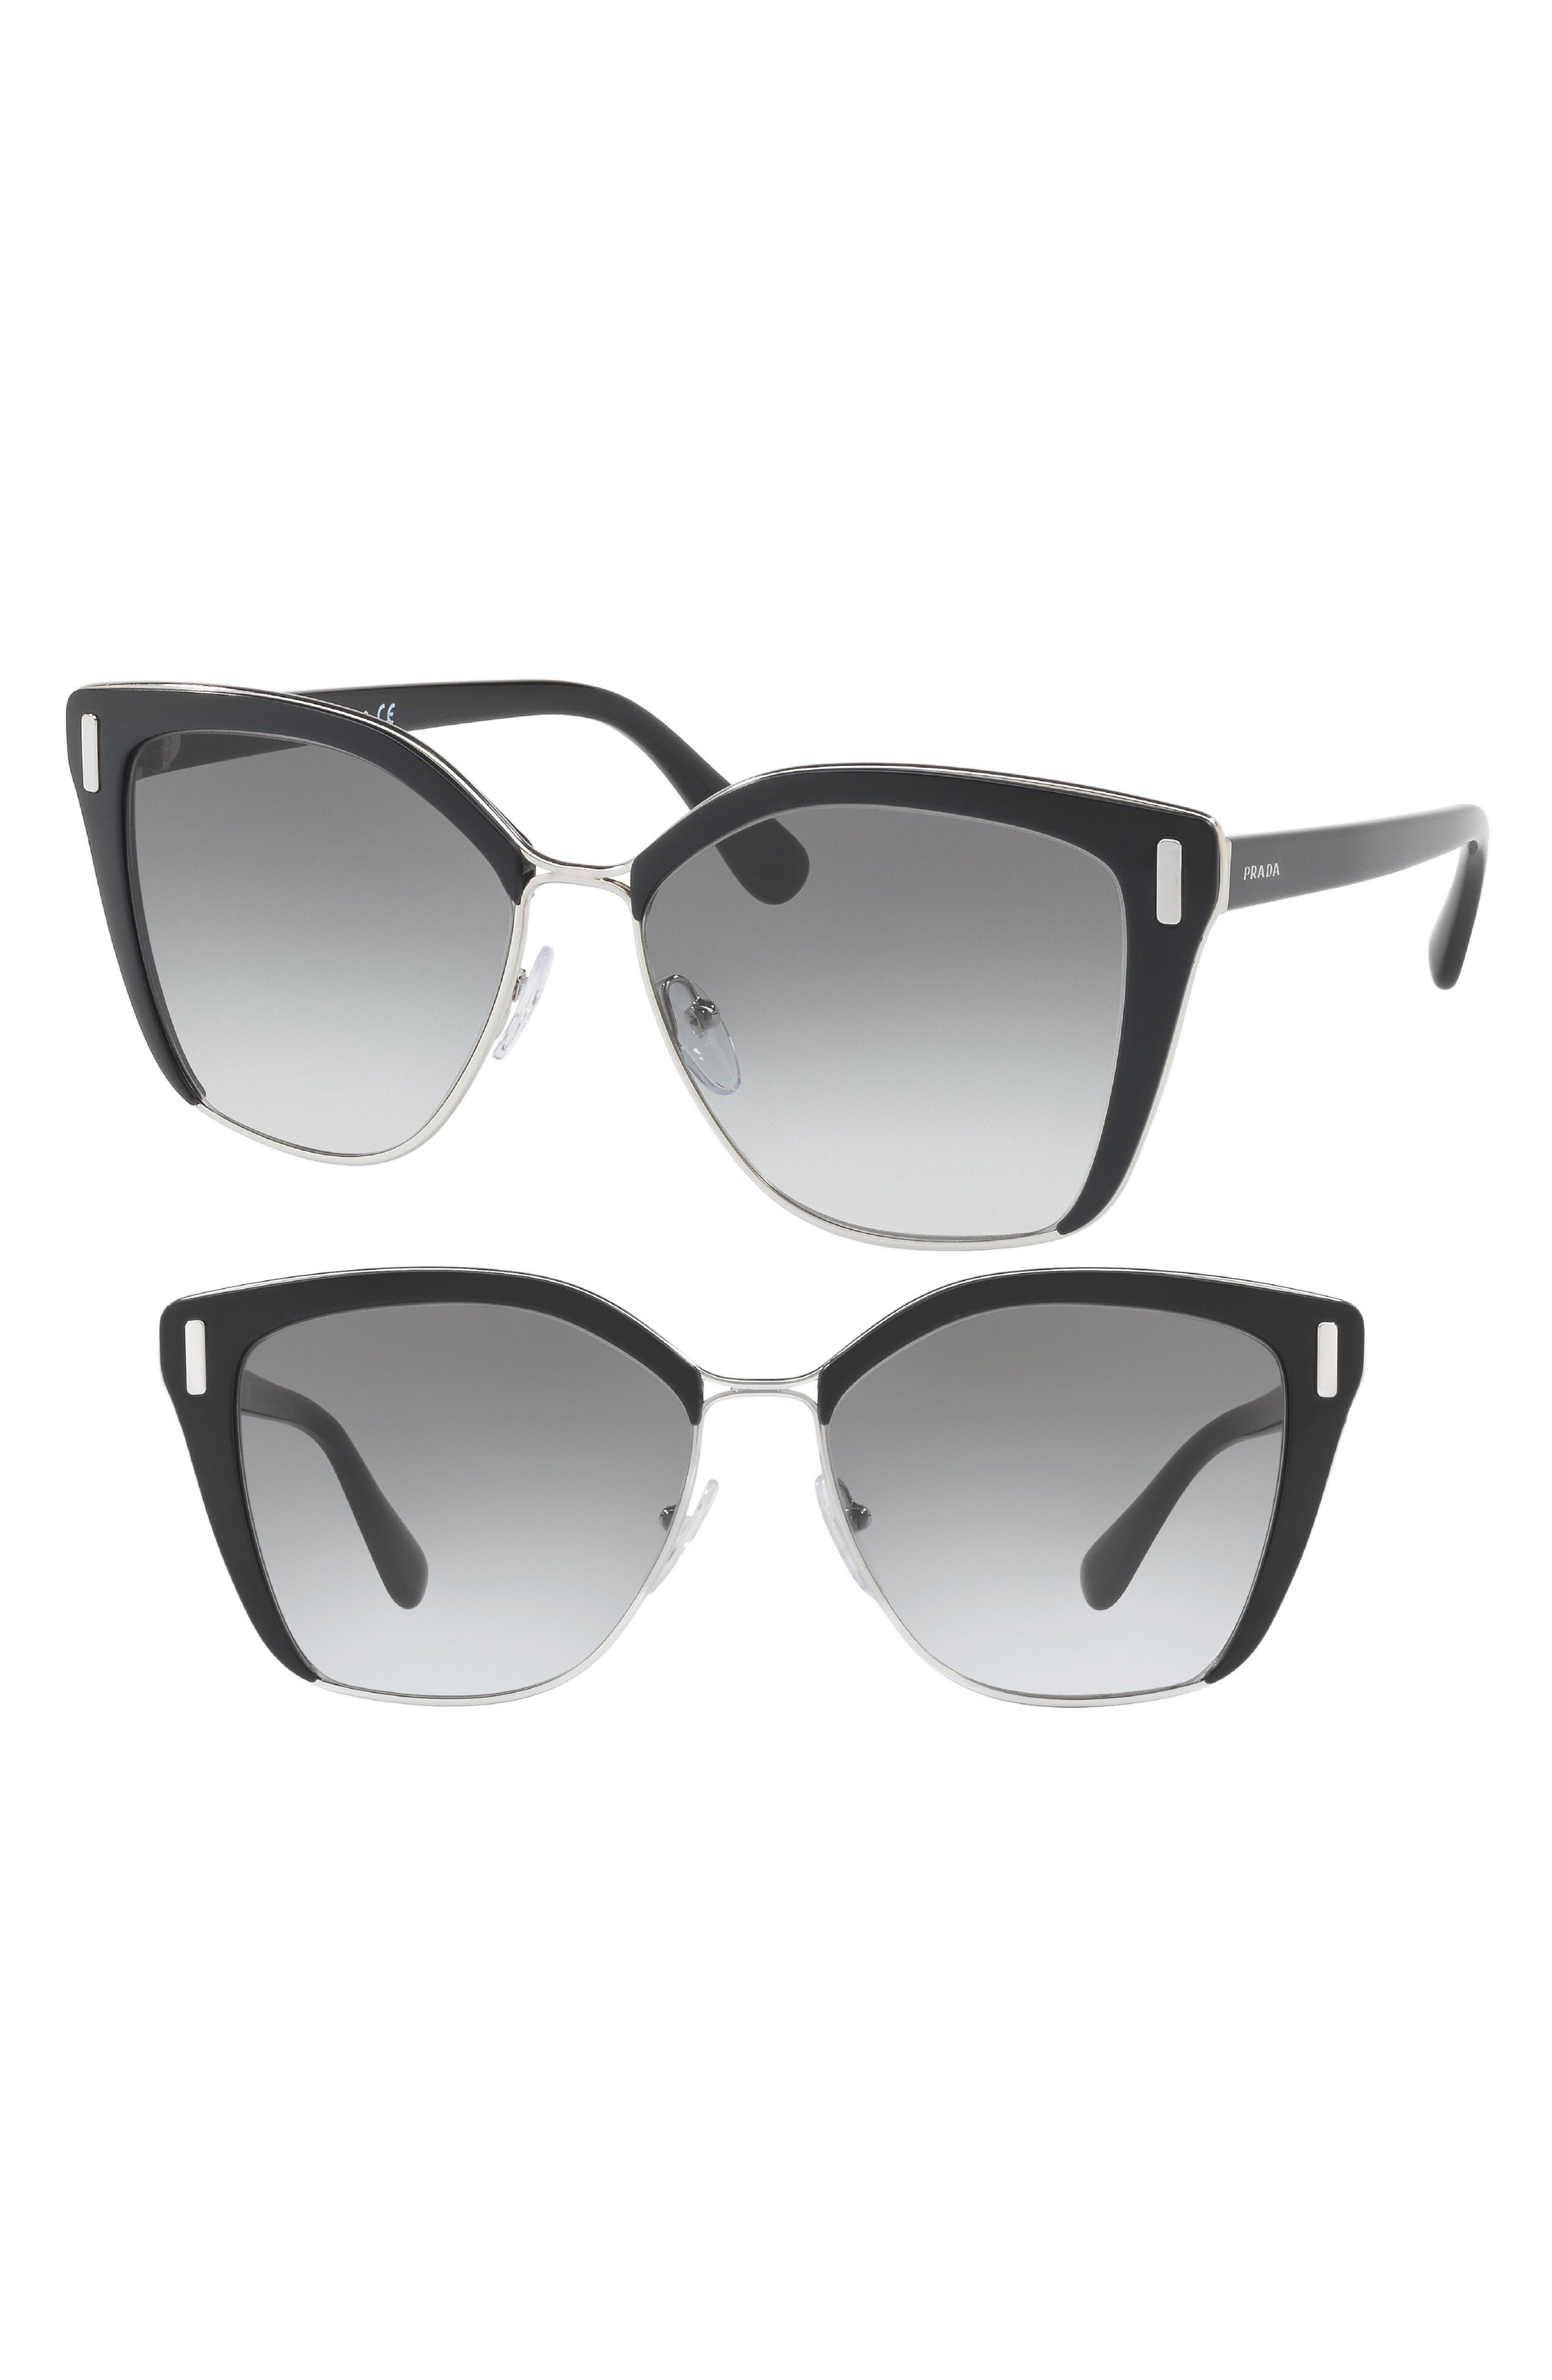 57mm Gradient Geometric Sunglasses,                         Main,                         color, Black/ Silver